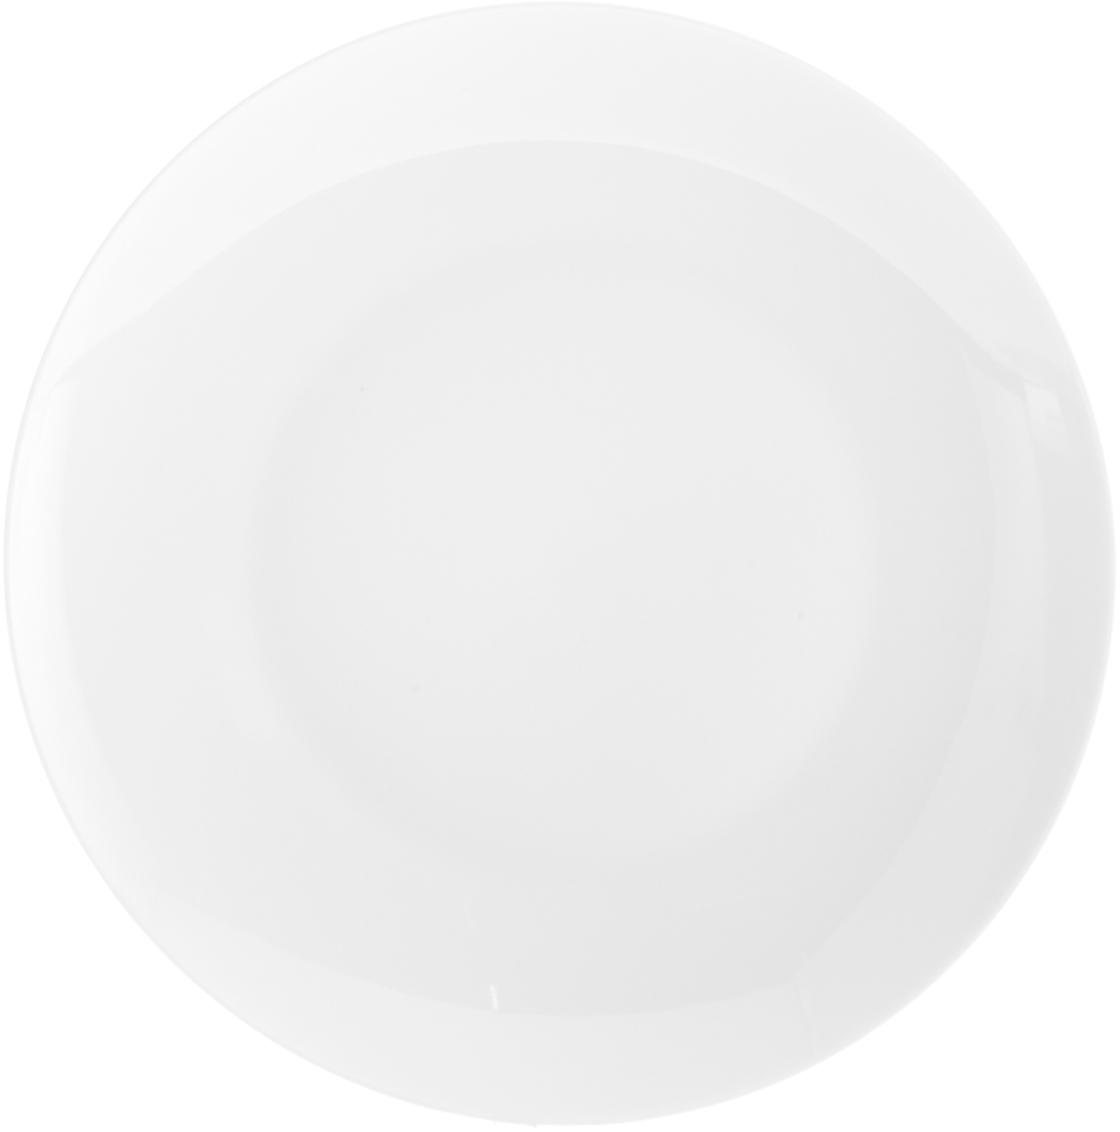 Talerz duży Delight Modern, 2 szt., Porcelana, Biały, Ø 27 cm